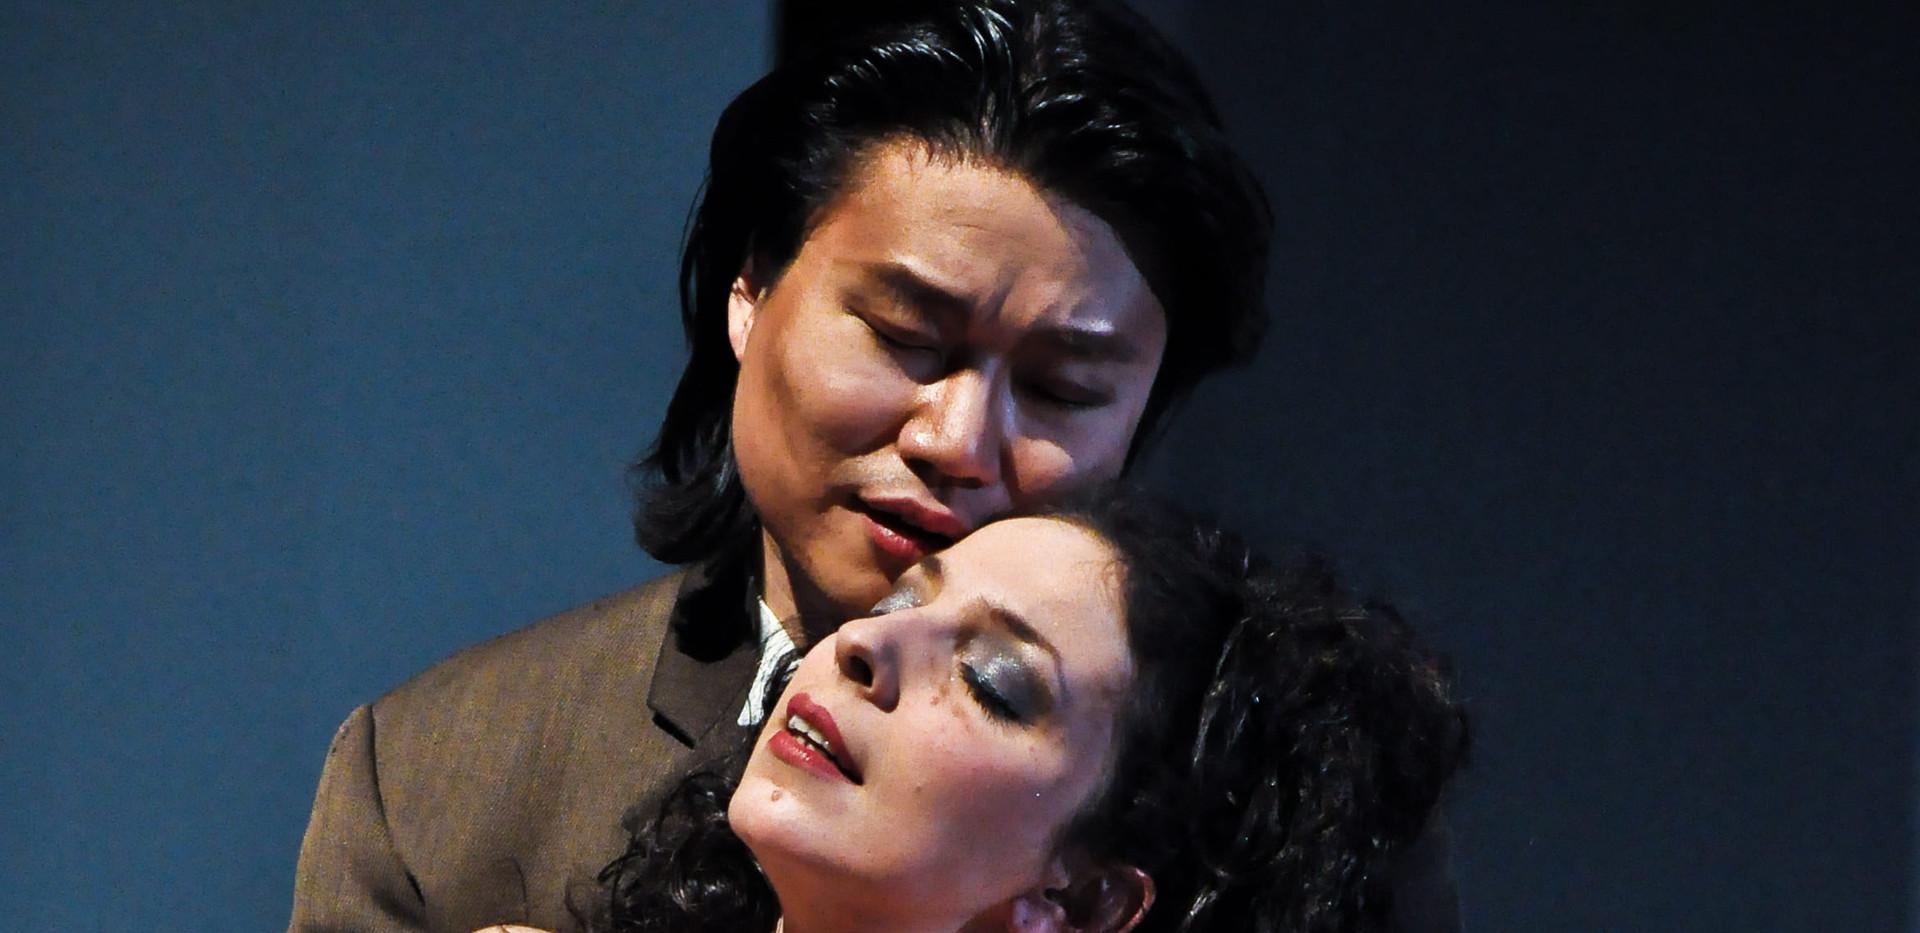 Traviata - Violetta et alfredo - Marie J